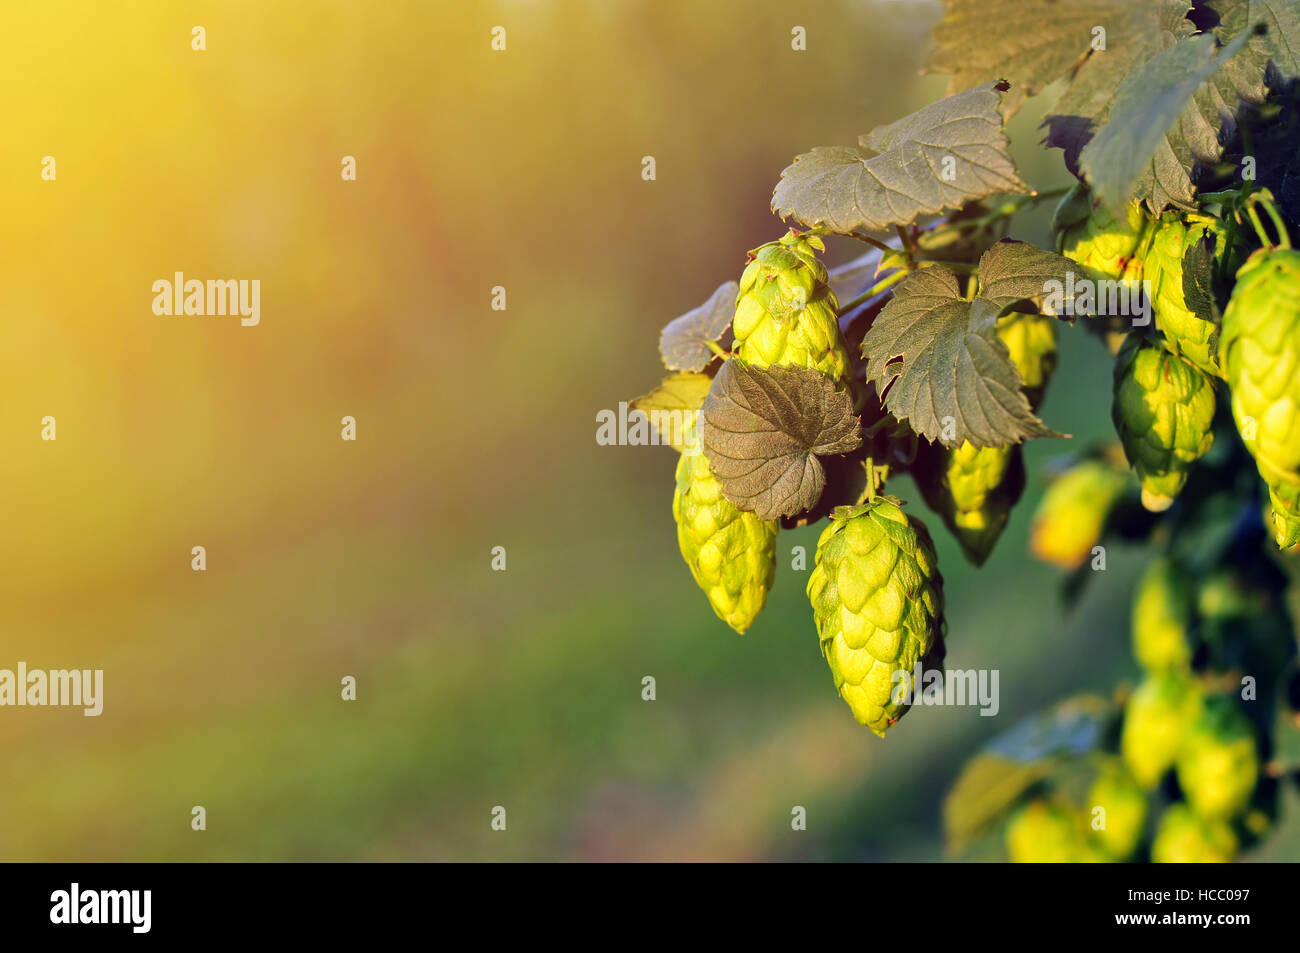 Green hops, lit by a warm sun light - Stock Image